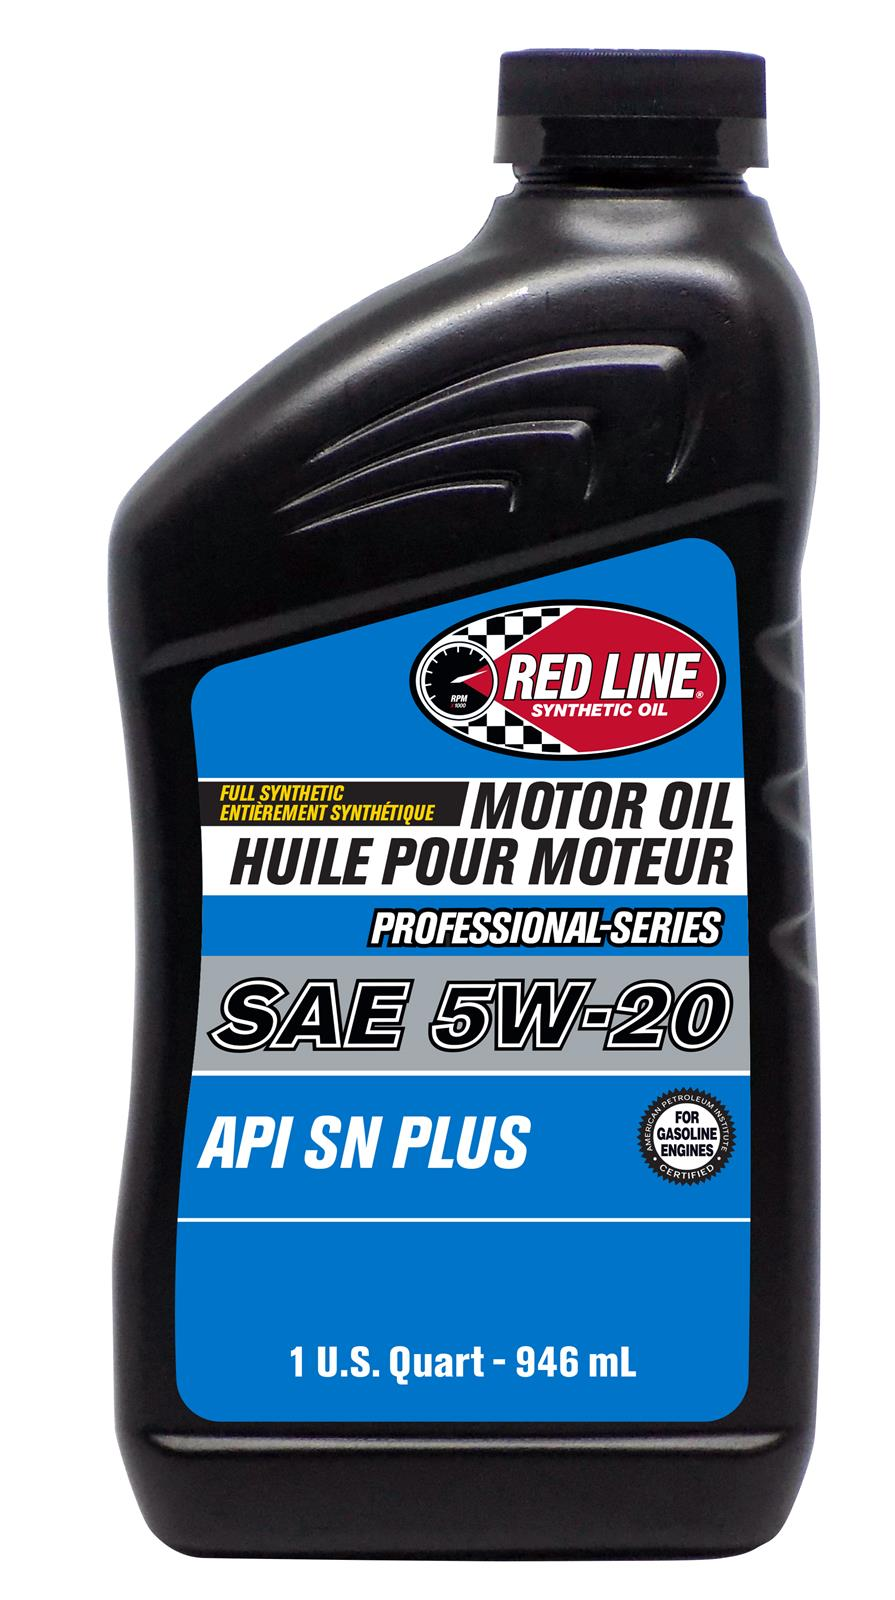 Red Line Pro-Series API SN+ 5W20 Motor Oil - Quart